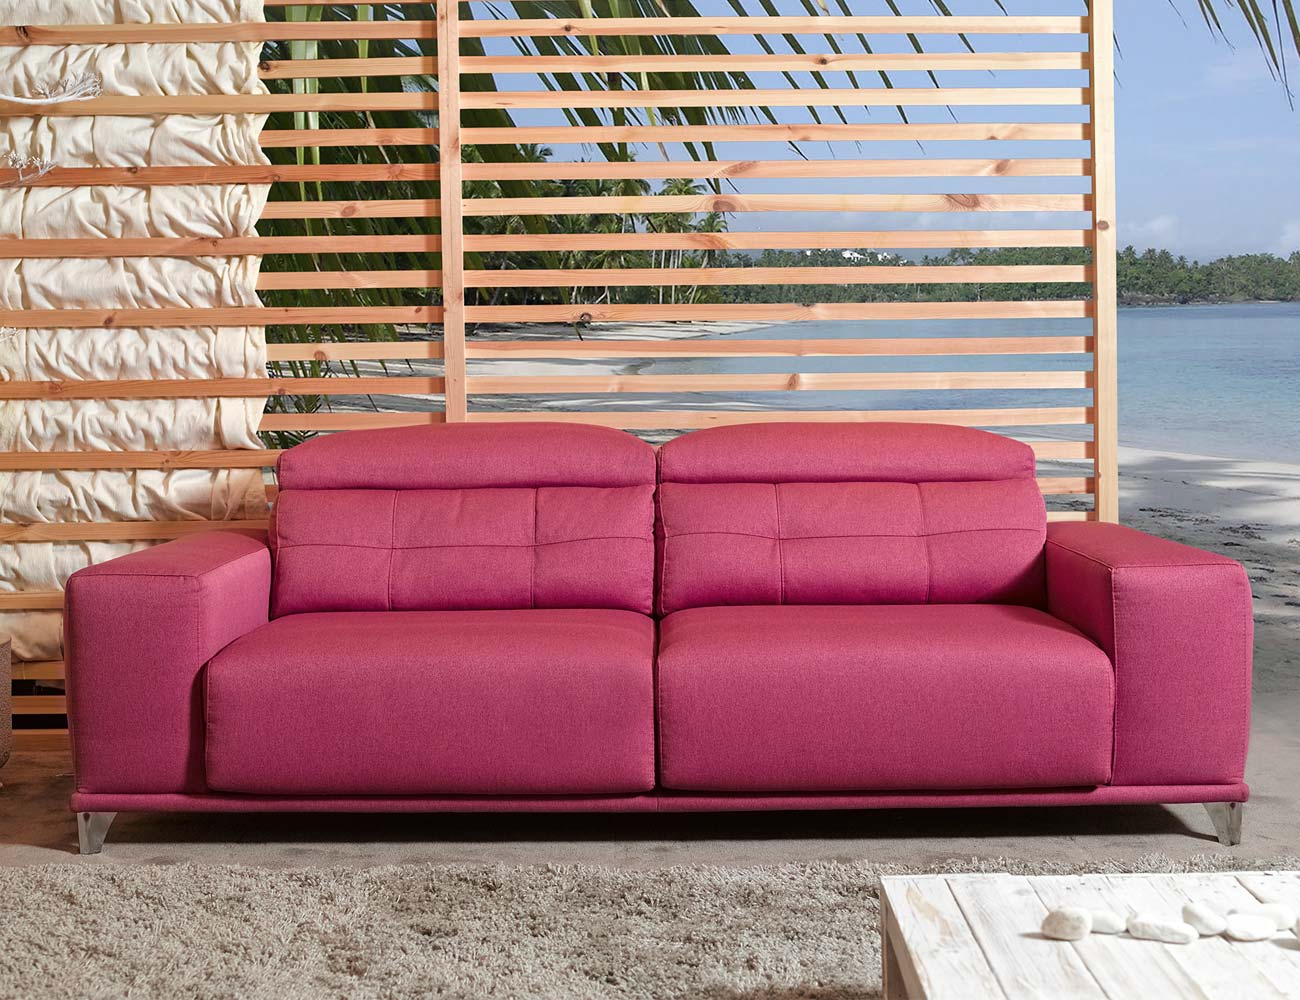 Sofa 3 plazas deslizante alta gama